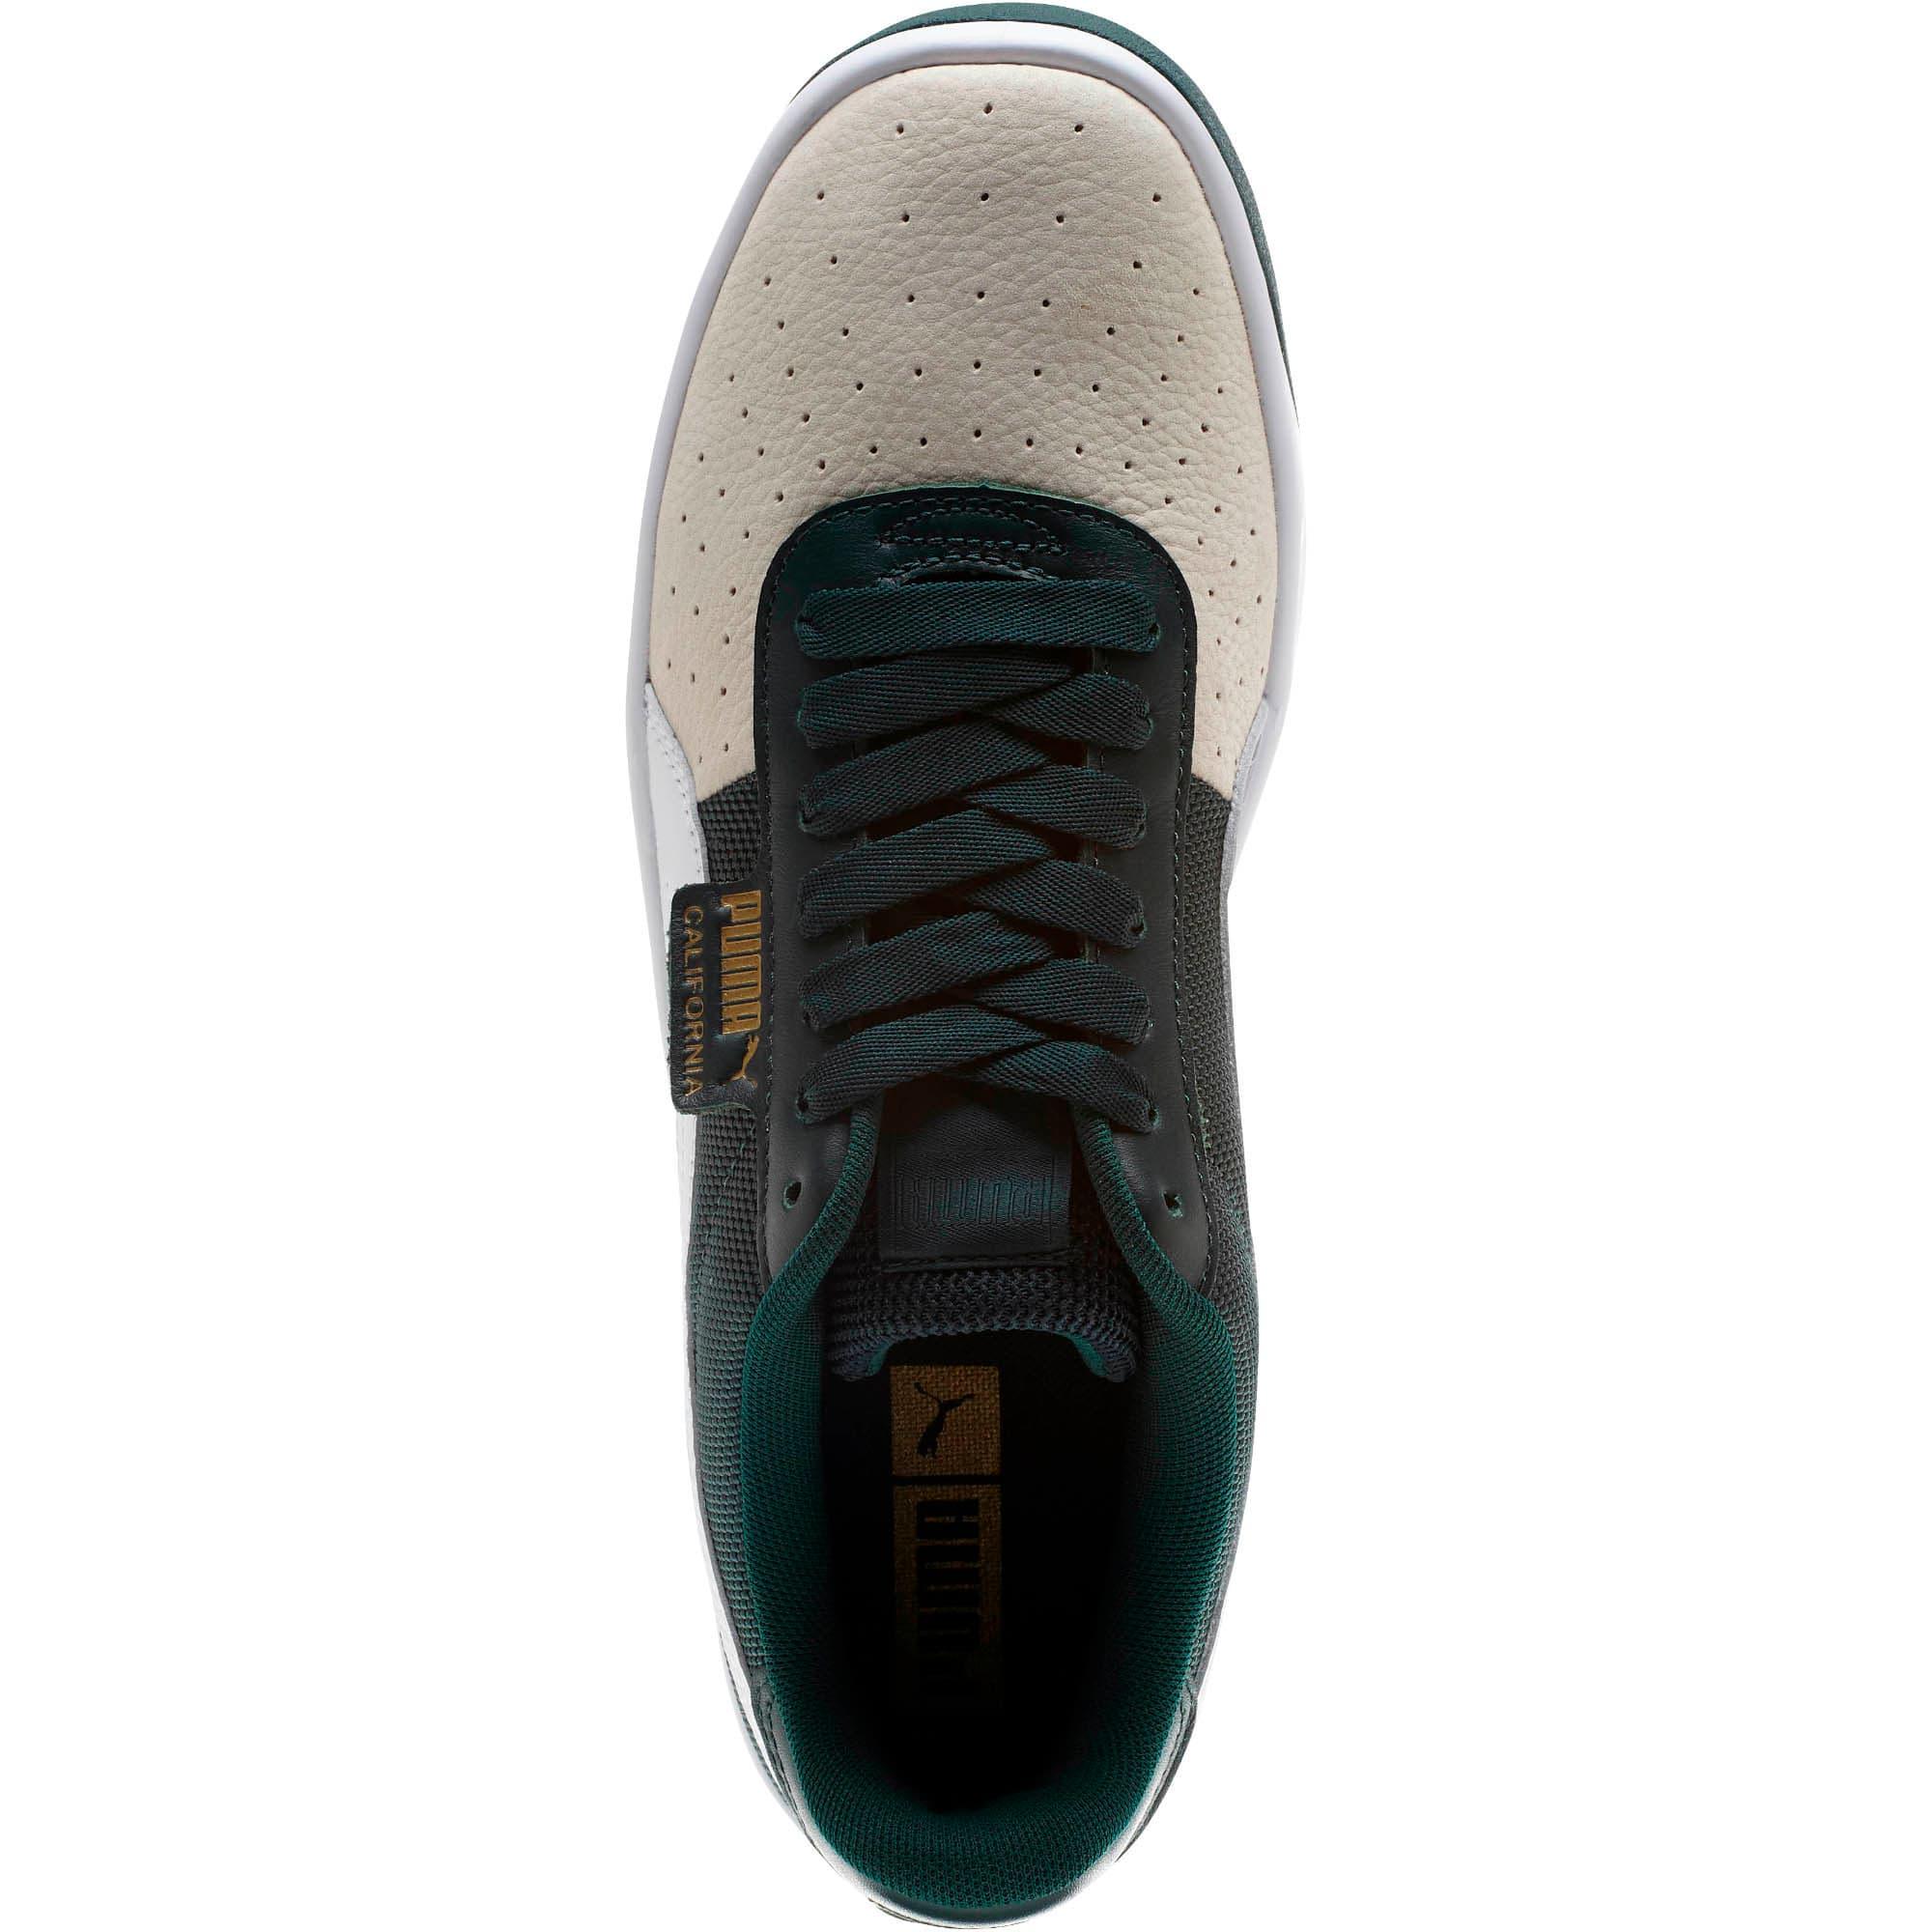 Thumbnail 5 of California Sneakers, WhsprWht-PonderosaPin-PumWht, medium